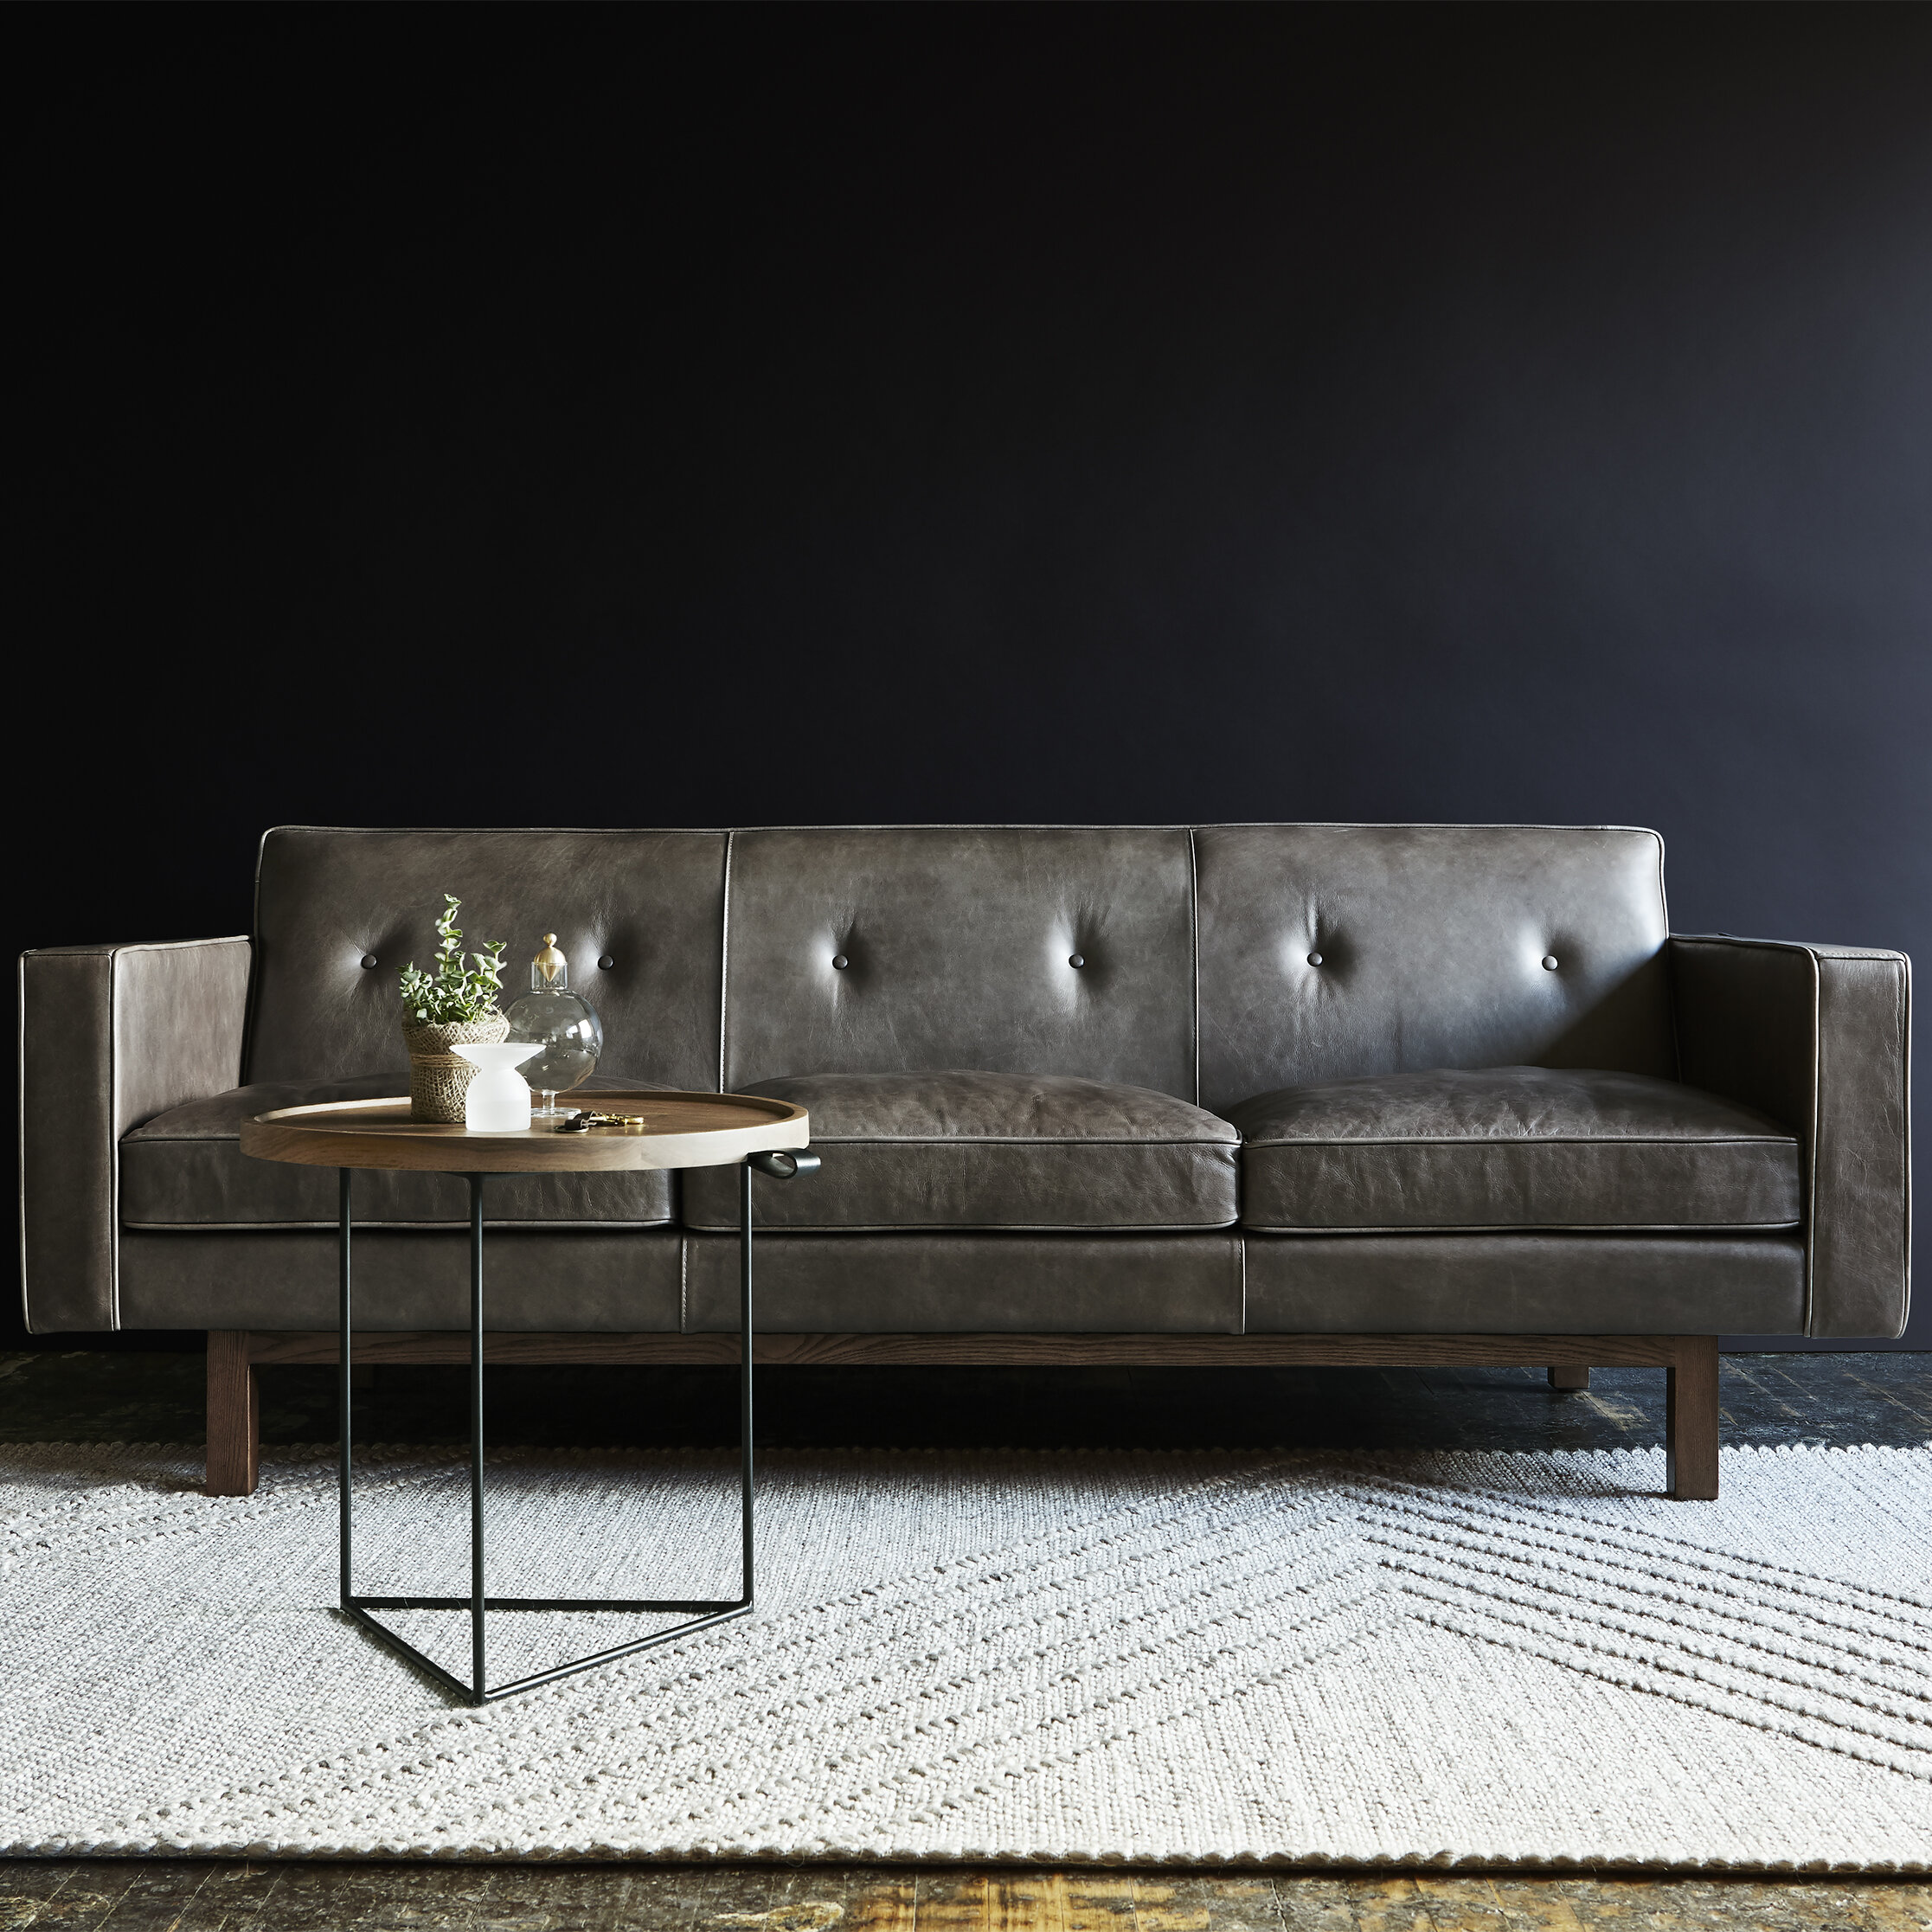 Gus modern embassy leather sofa reviews wayfair ca